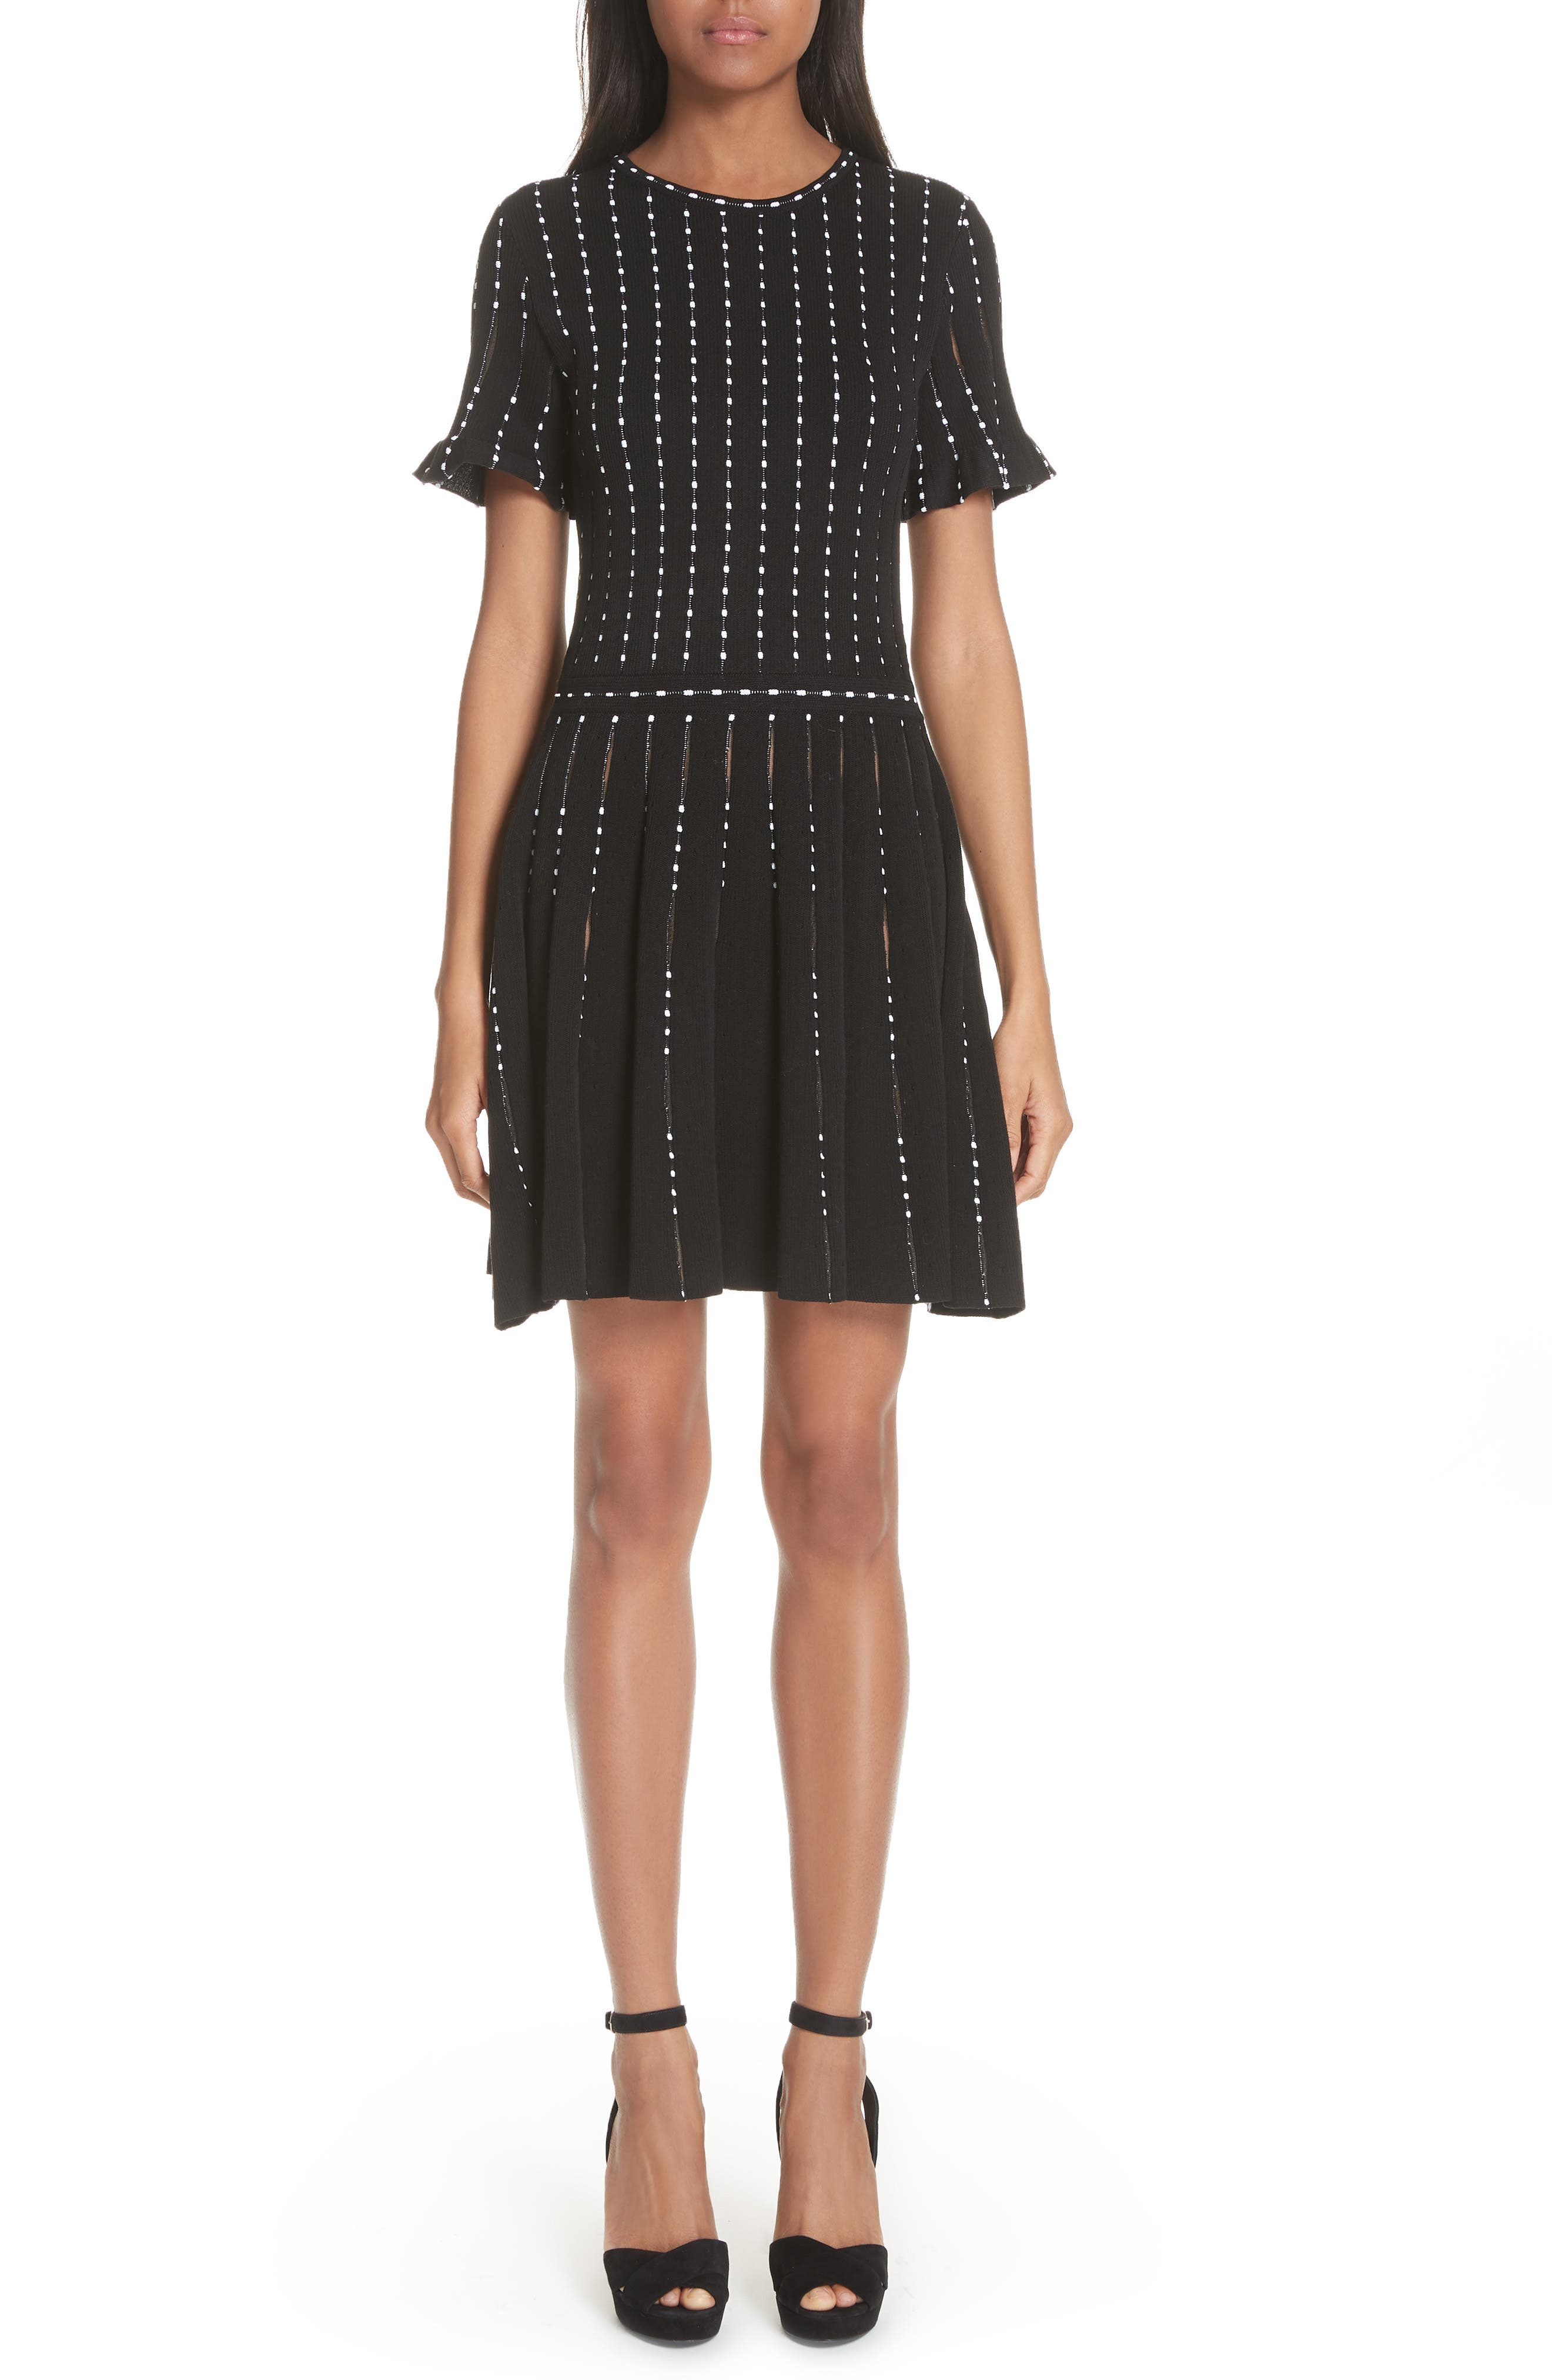 Oscar De La Renta Embroidered Knit Dress